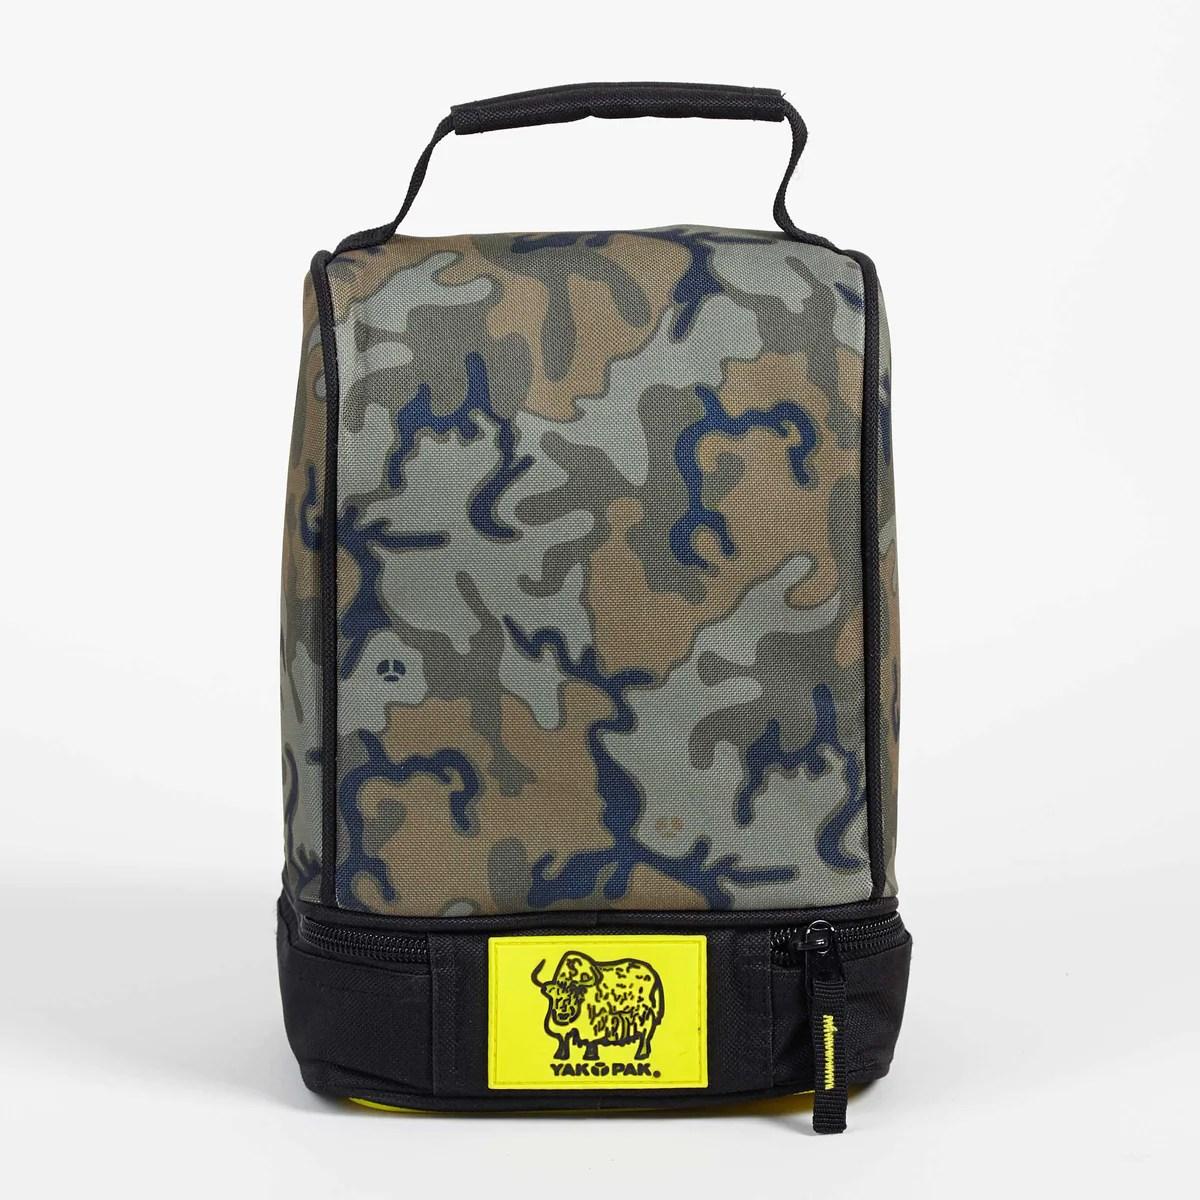 Yak Pak Green Camo Lunch Bag Minnow Mars